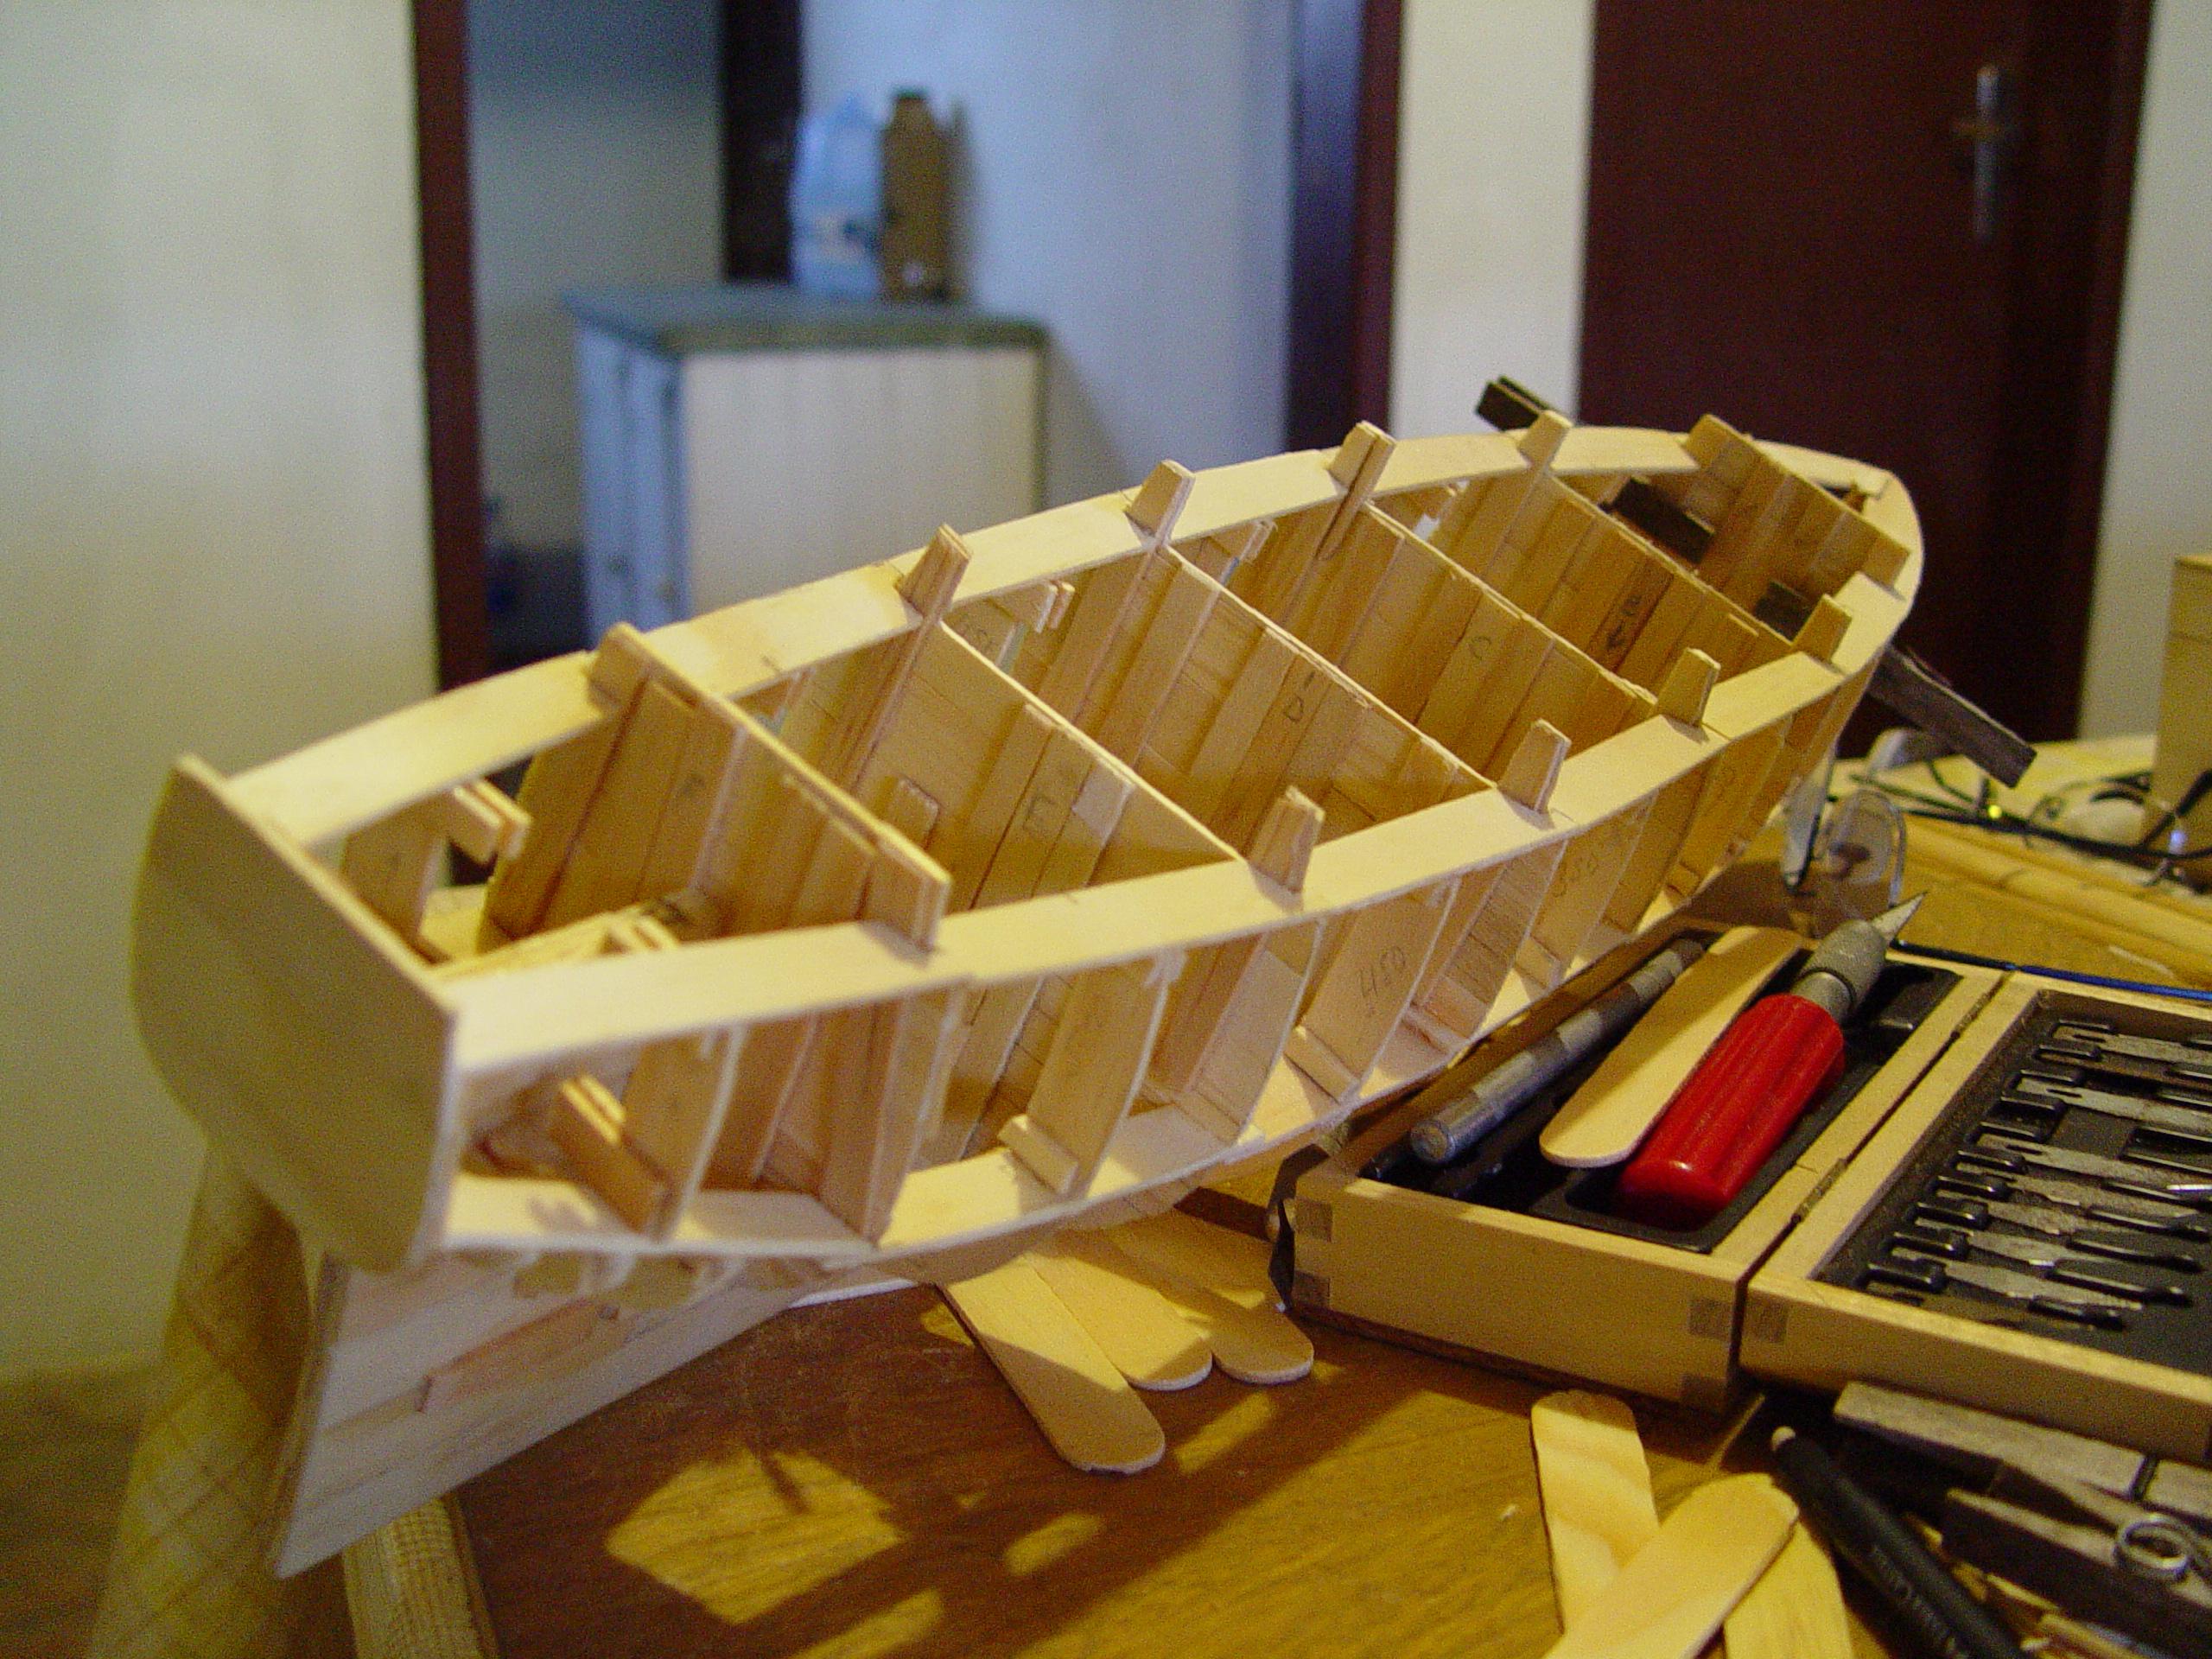 Artesanato Ideias Para Pascoa ~ Artesanato Barco De Madeira Passo A Passo IB04 Ivango